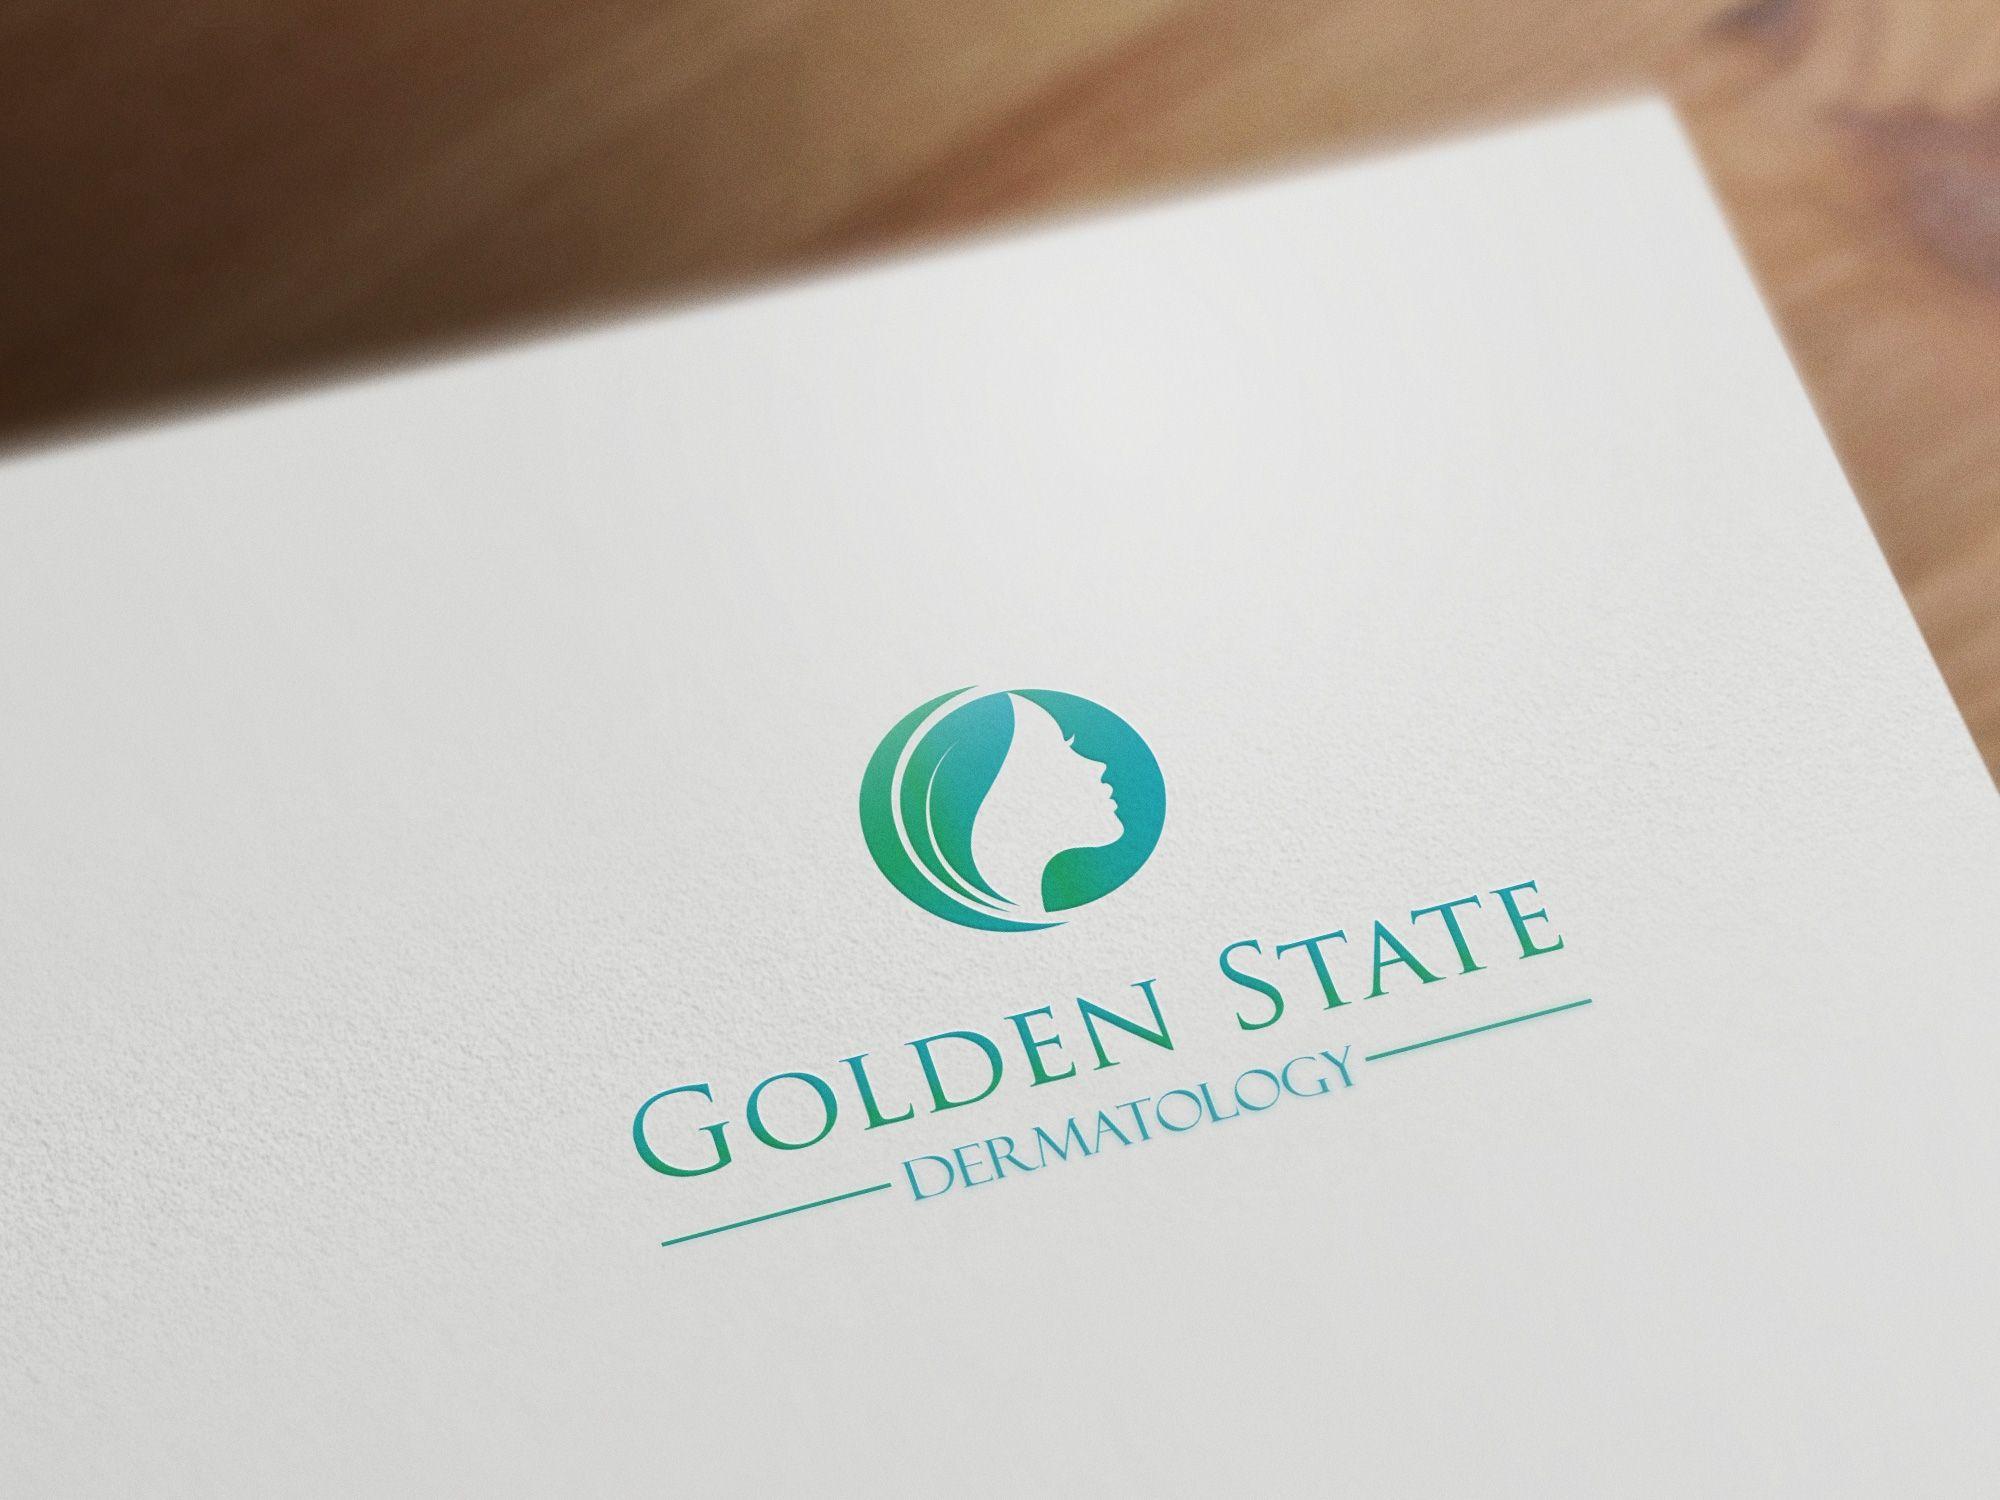 Overused logo designs sold on 99designs com - Golden State